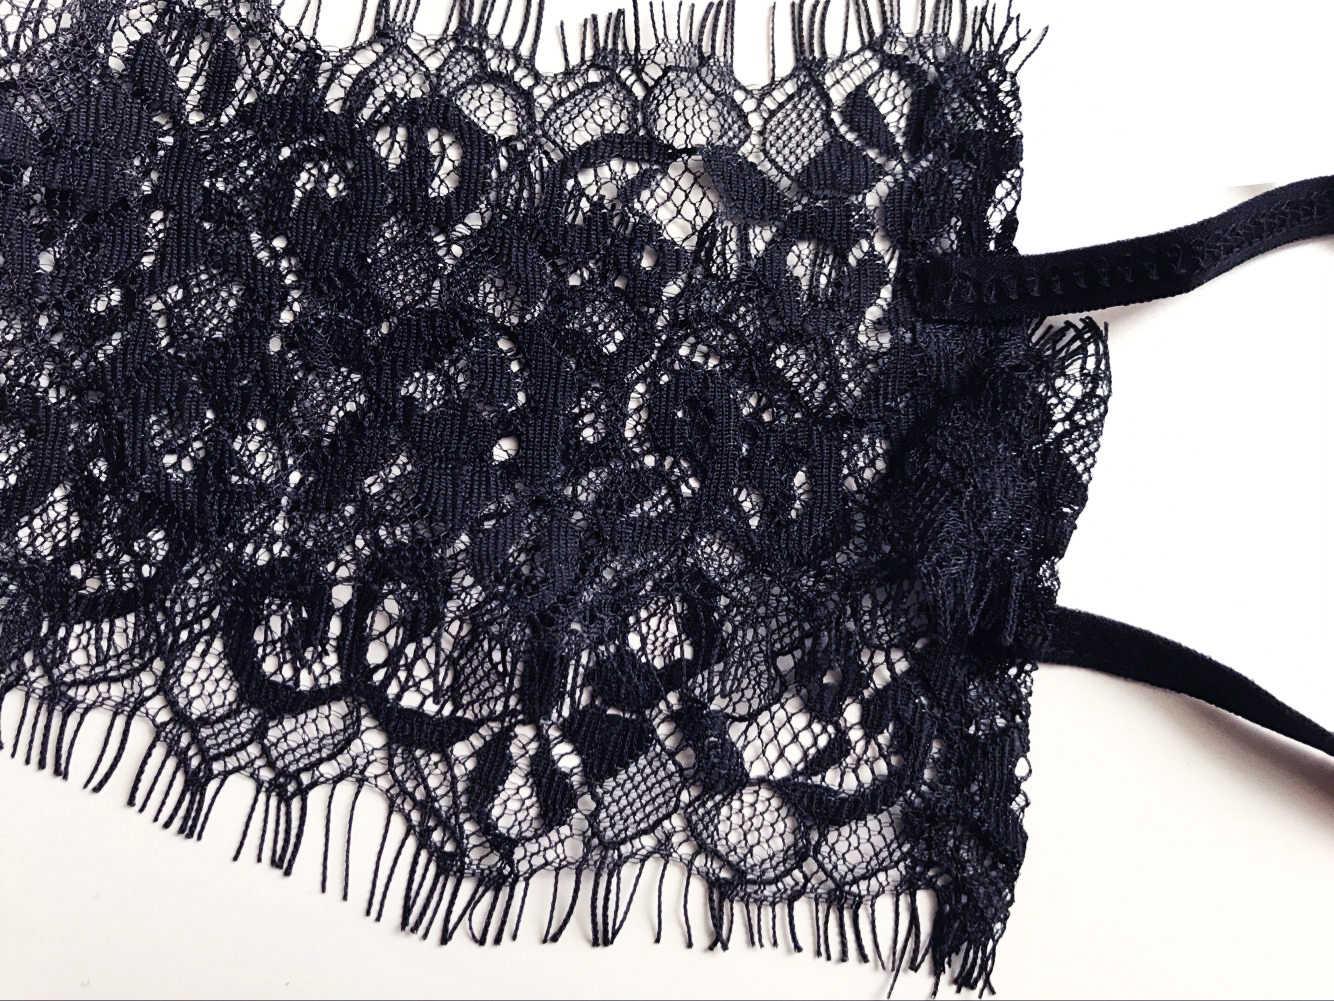 Seksi Leopard Silk Lingerie Renda Kostum Baju Seksi Pakaian Teddy Babydoll Baju Tidur Notte Intimo Baju Tidur 8916